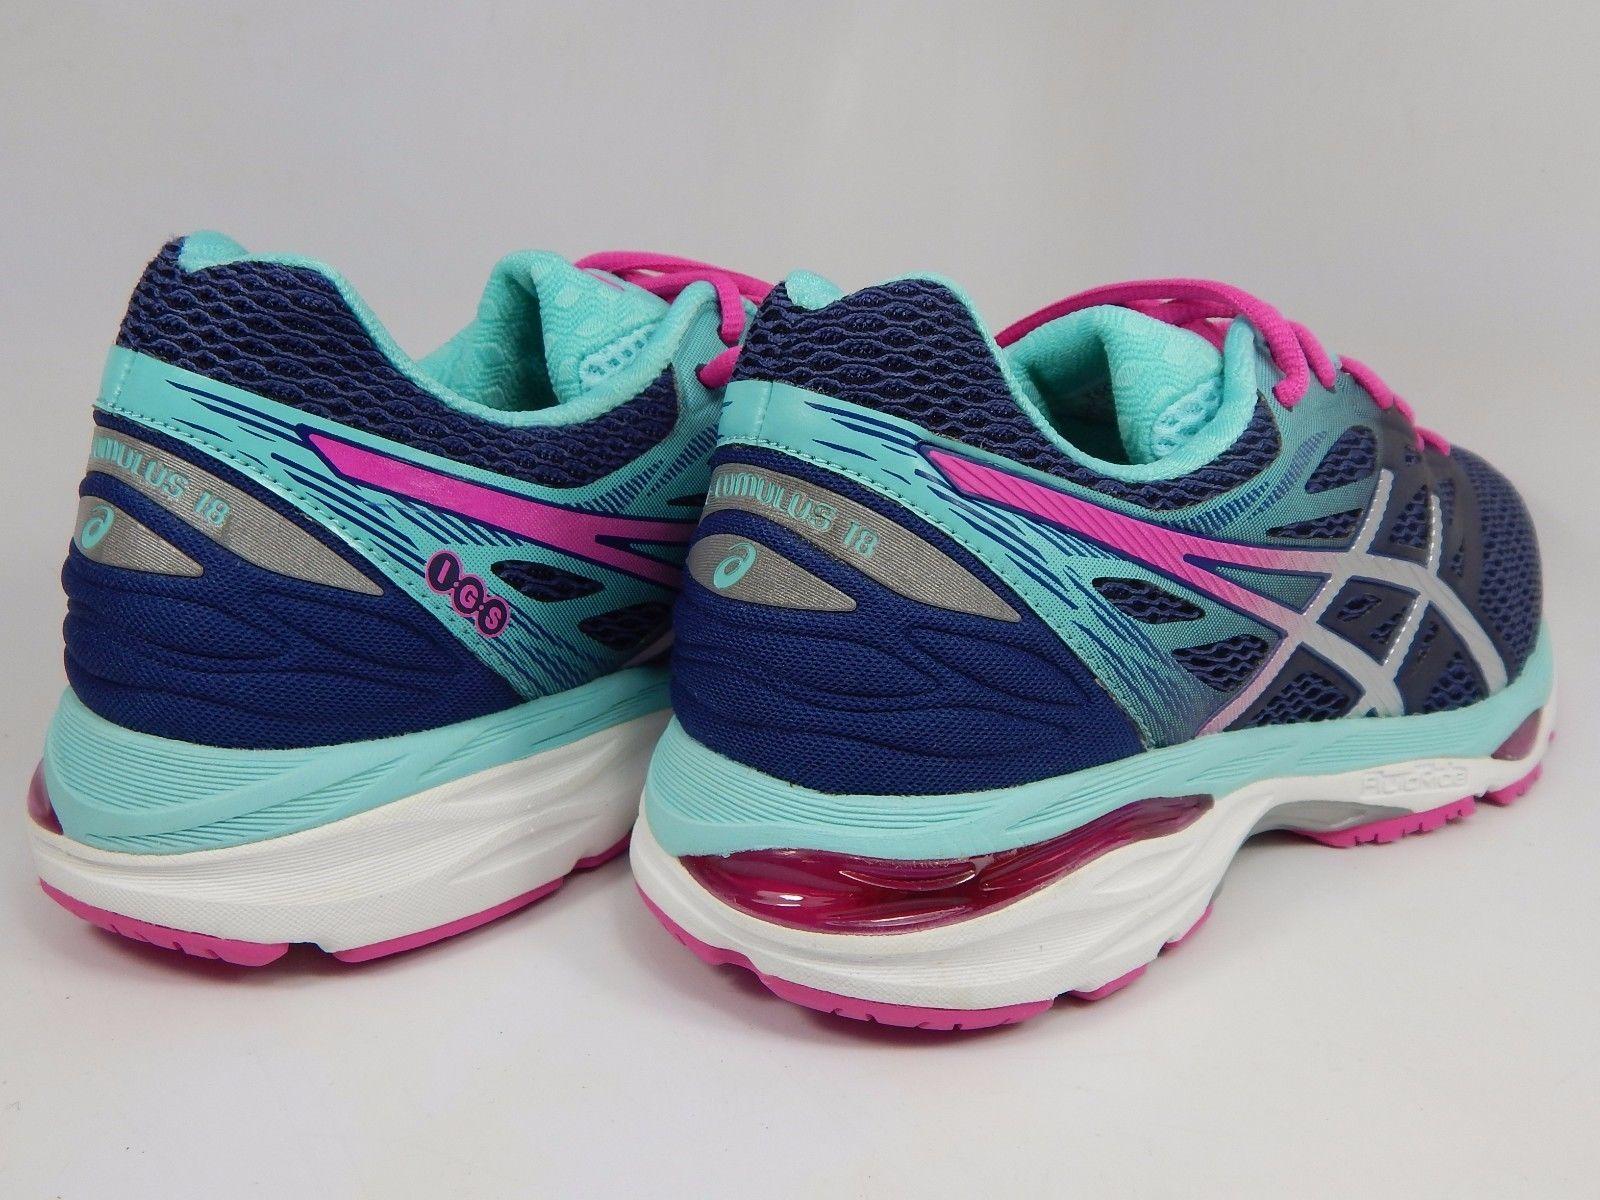 Asics Gel Cumulus 18 Women's Running Shoes Size US 9.5 M (B) EU 41.5 Blue T6C8N